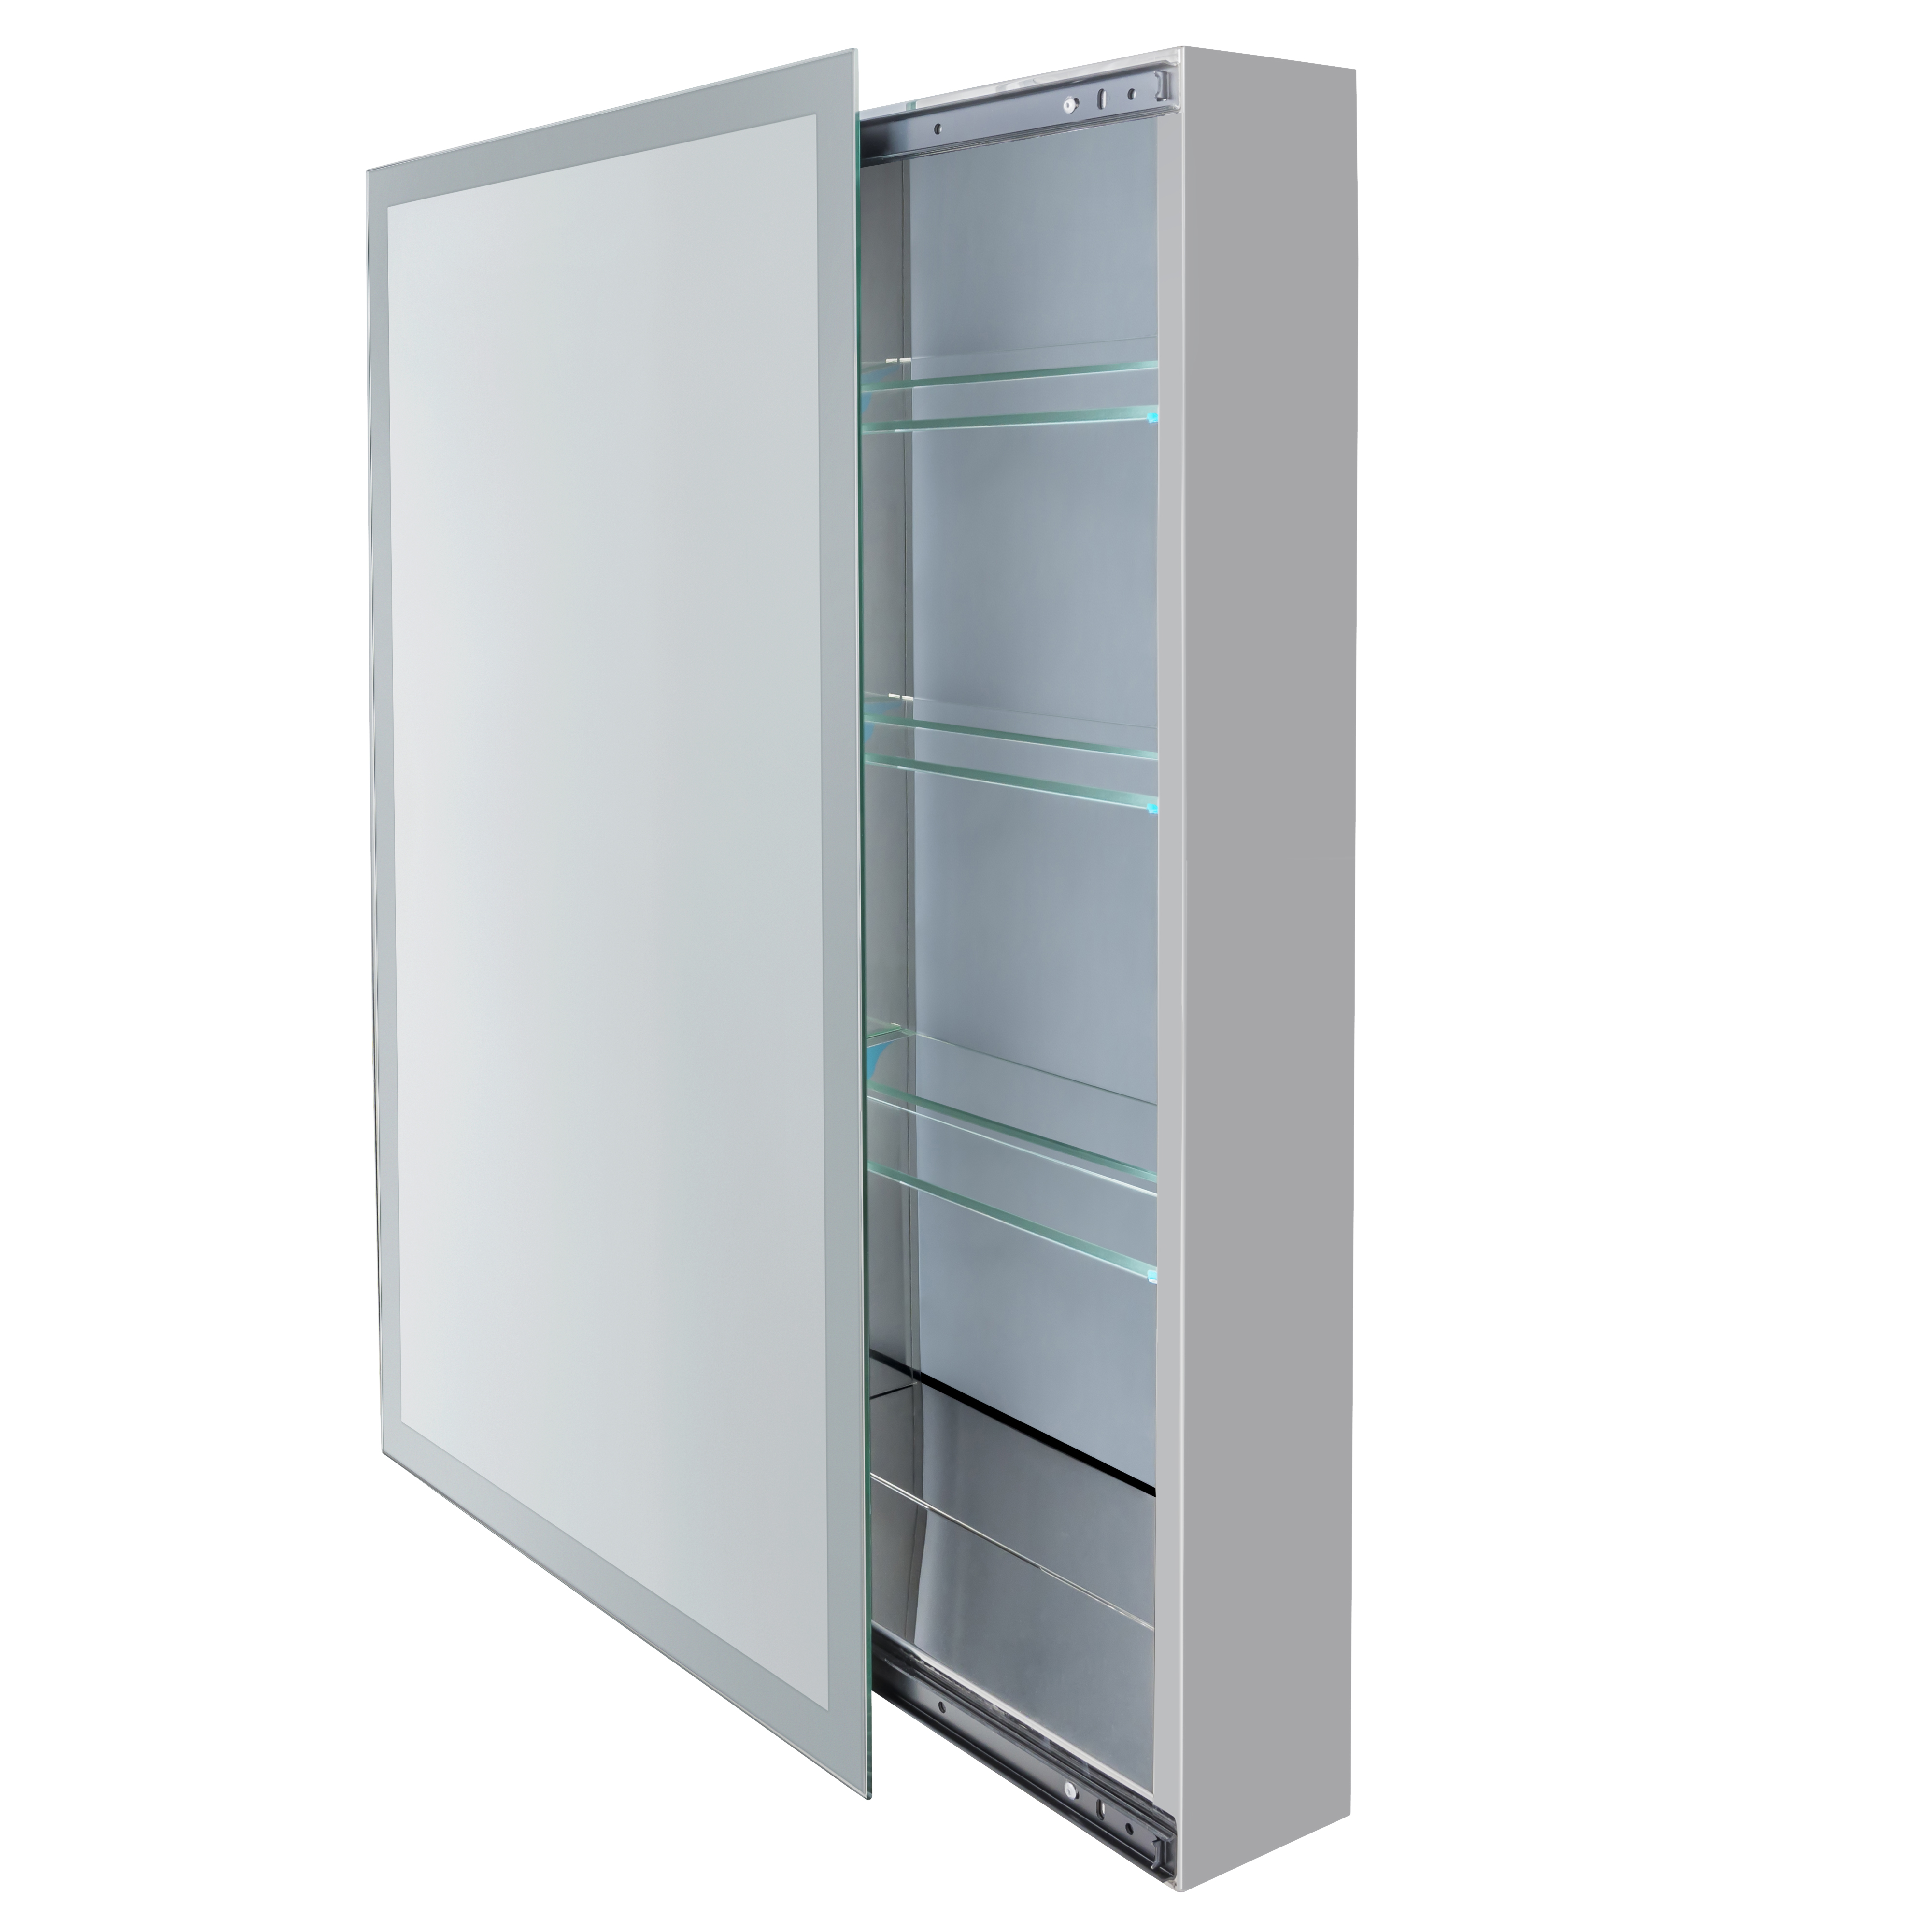 30 X 30 Medicine Cabinet Bathroom Sliding Mirror Medicine Cabinet W Frosted Glass Border 18